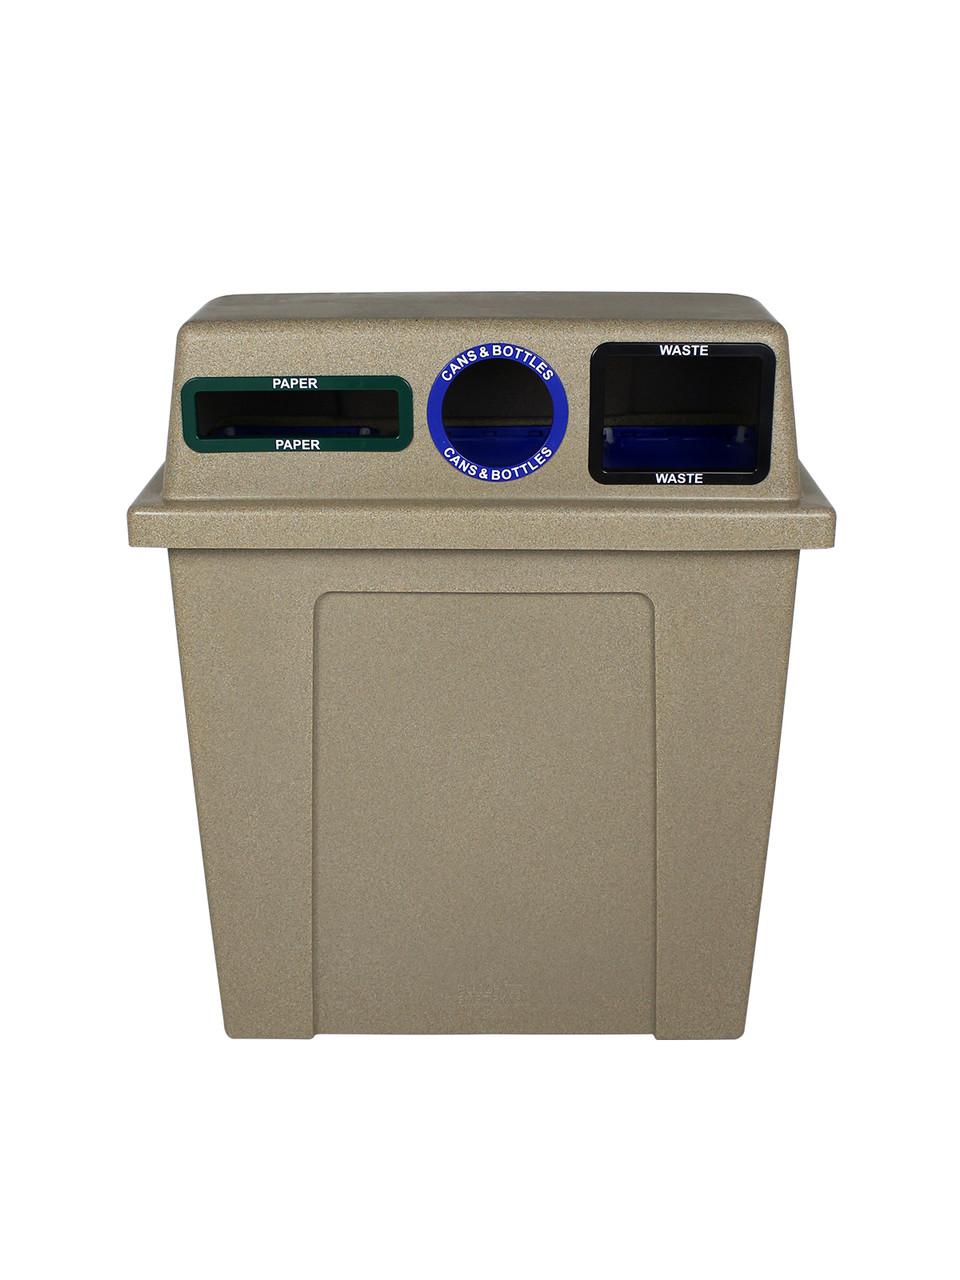 96 Gallon Plastic Dual 3 in 1 Recycling Bin Sandstone 101439 (Slot, Circle, Full)